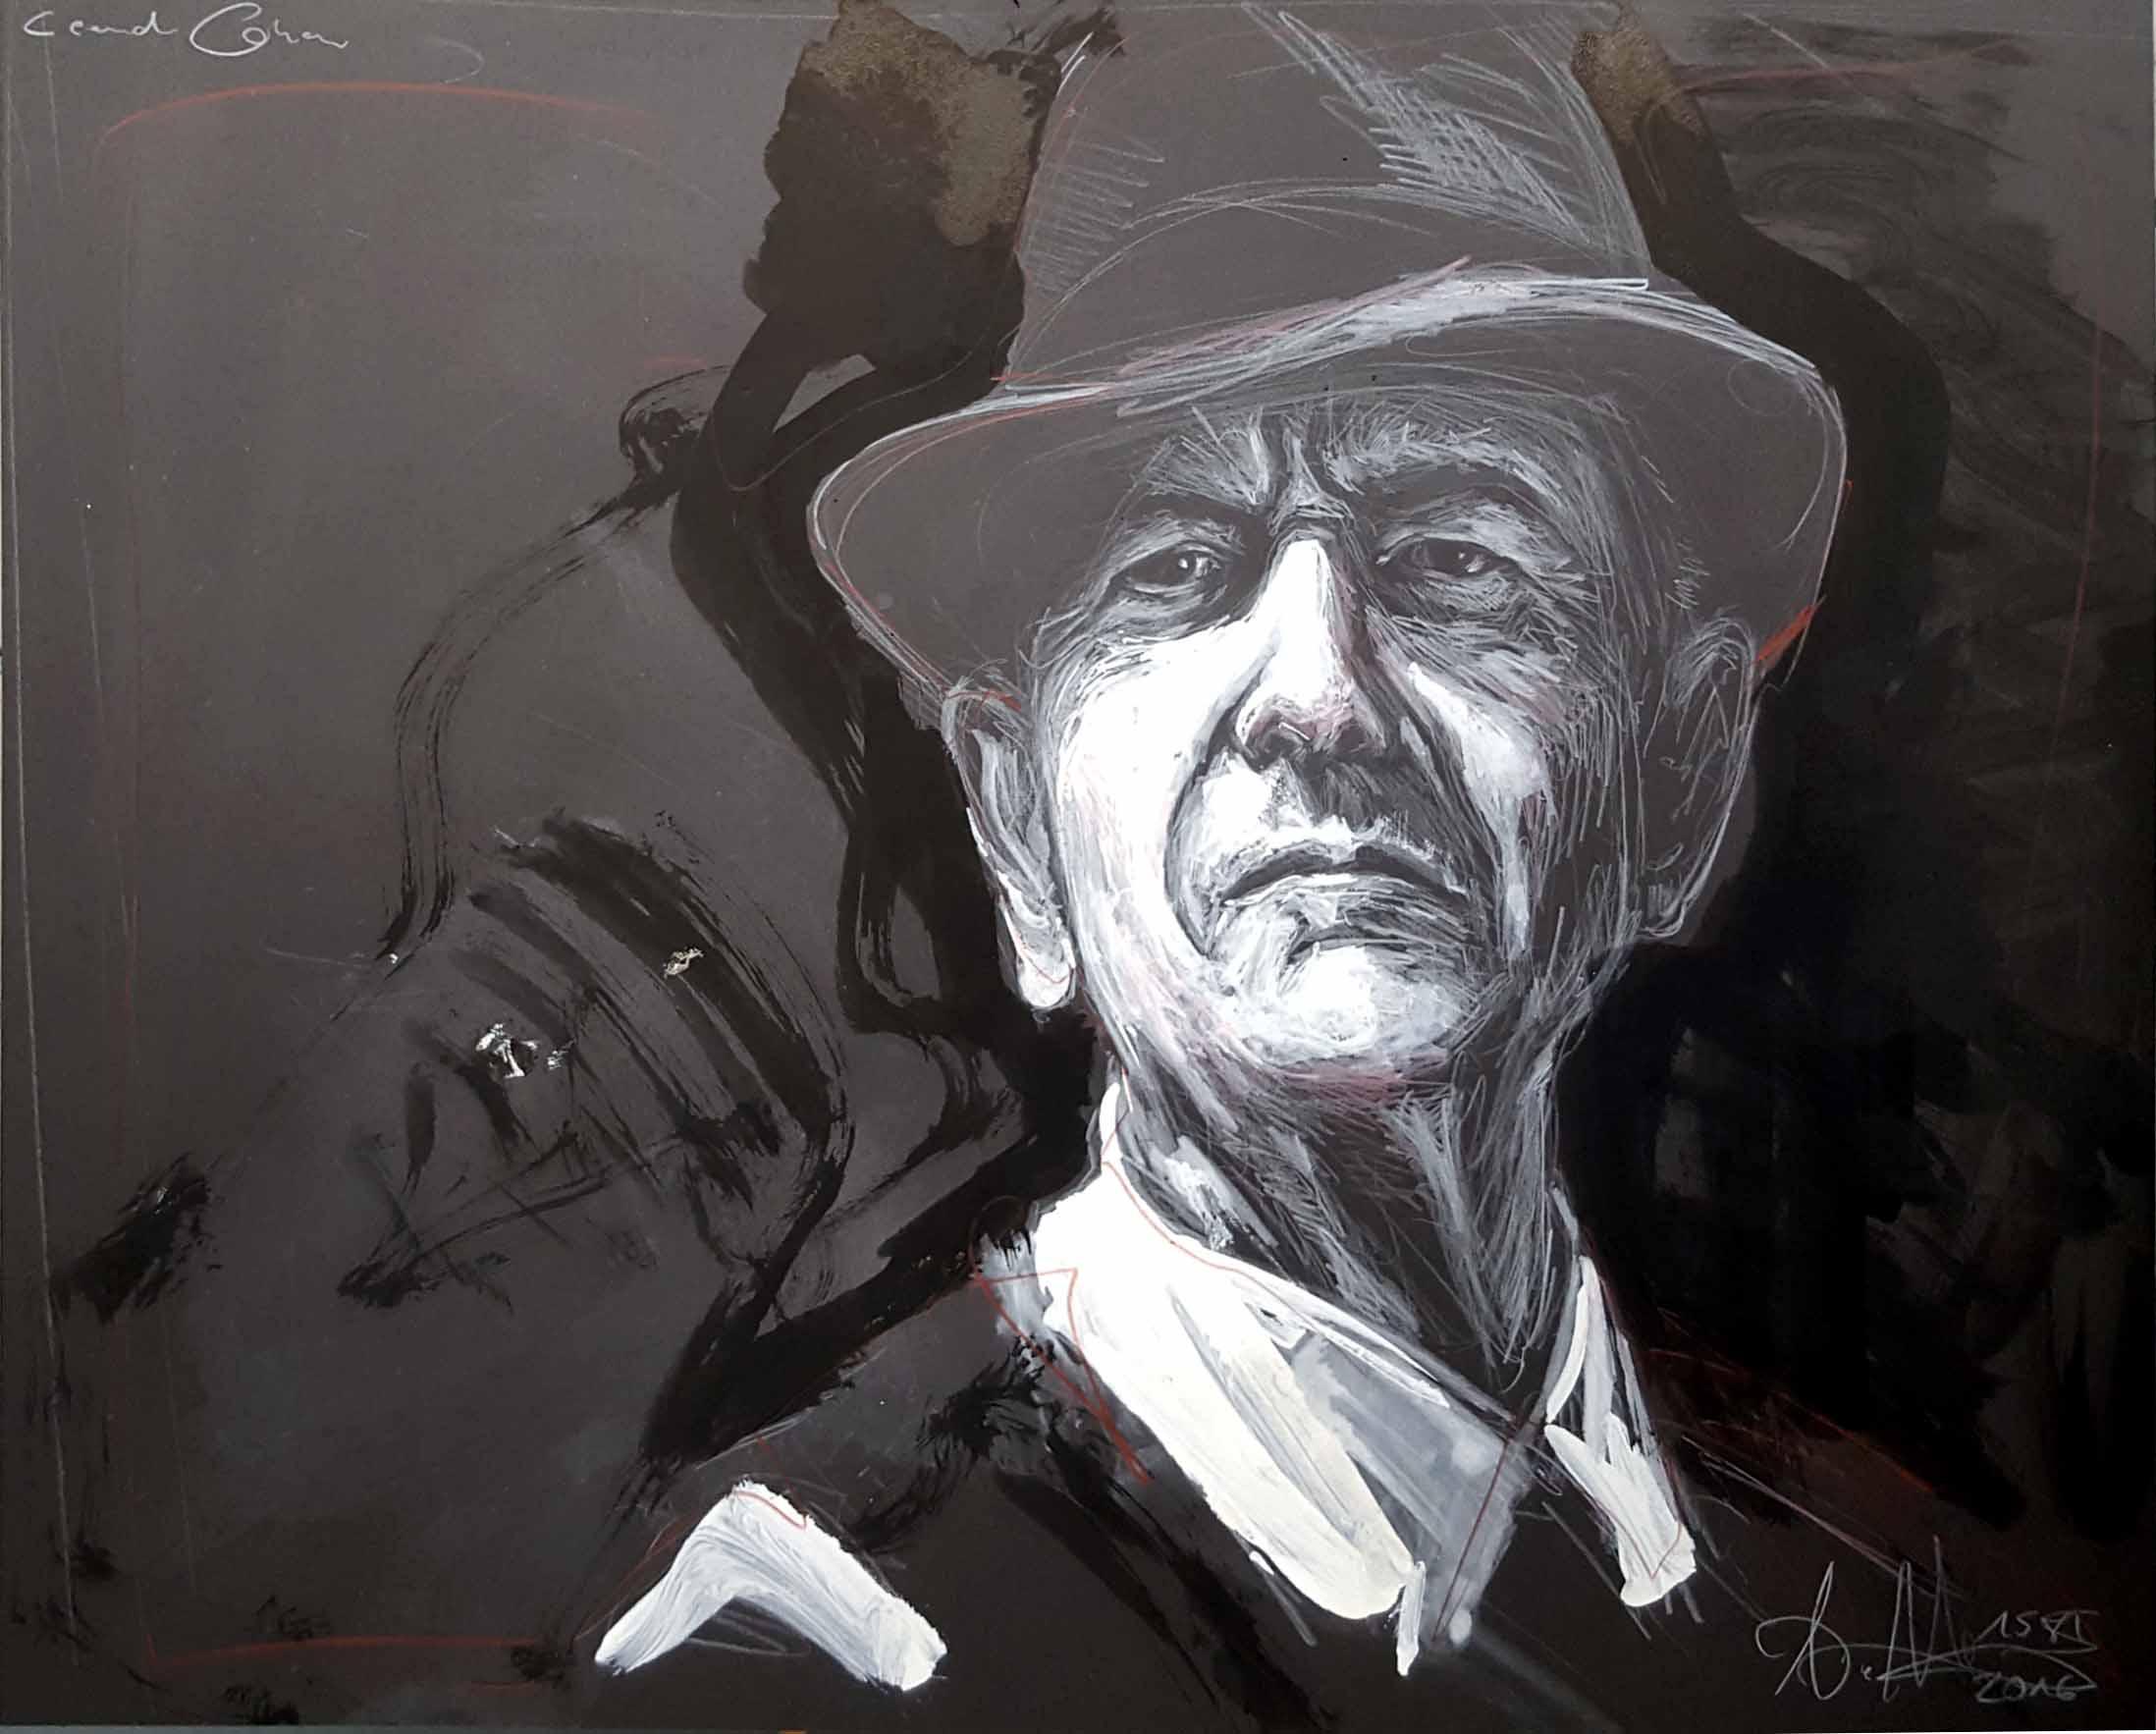 Leonard Cohan